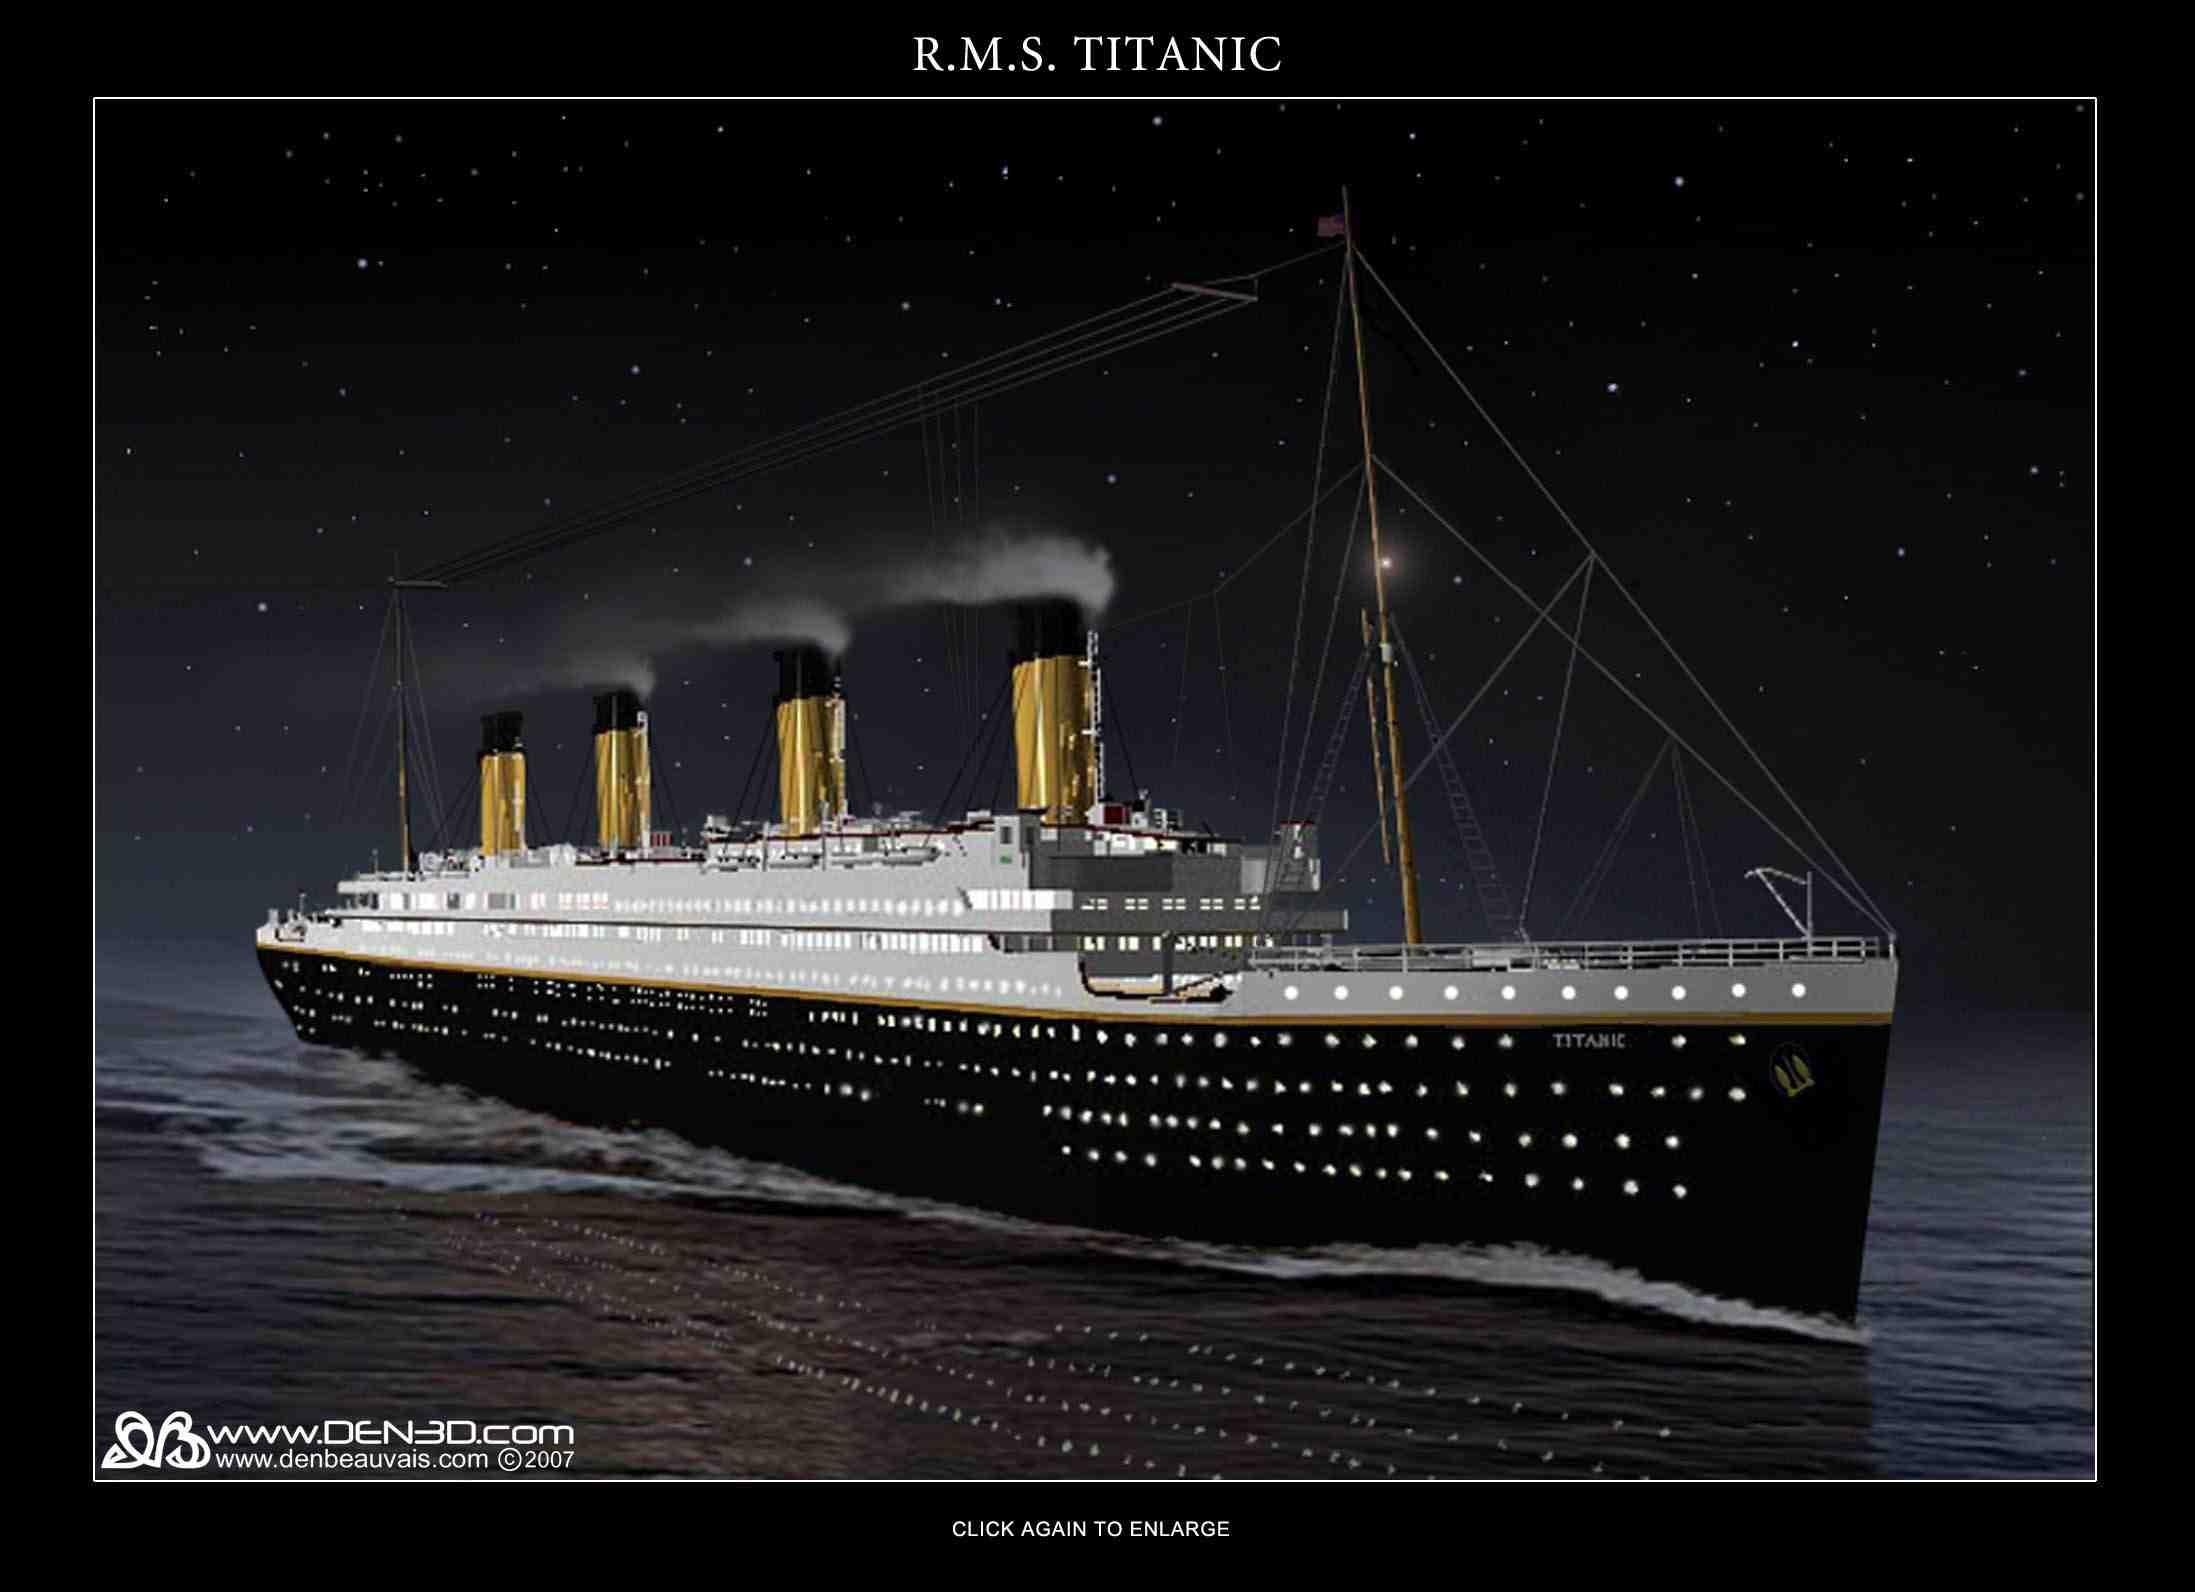 Titanic 3d Pro Live Wallpaper Free Download Titanic Sinking Wallpaper 59 Images